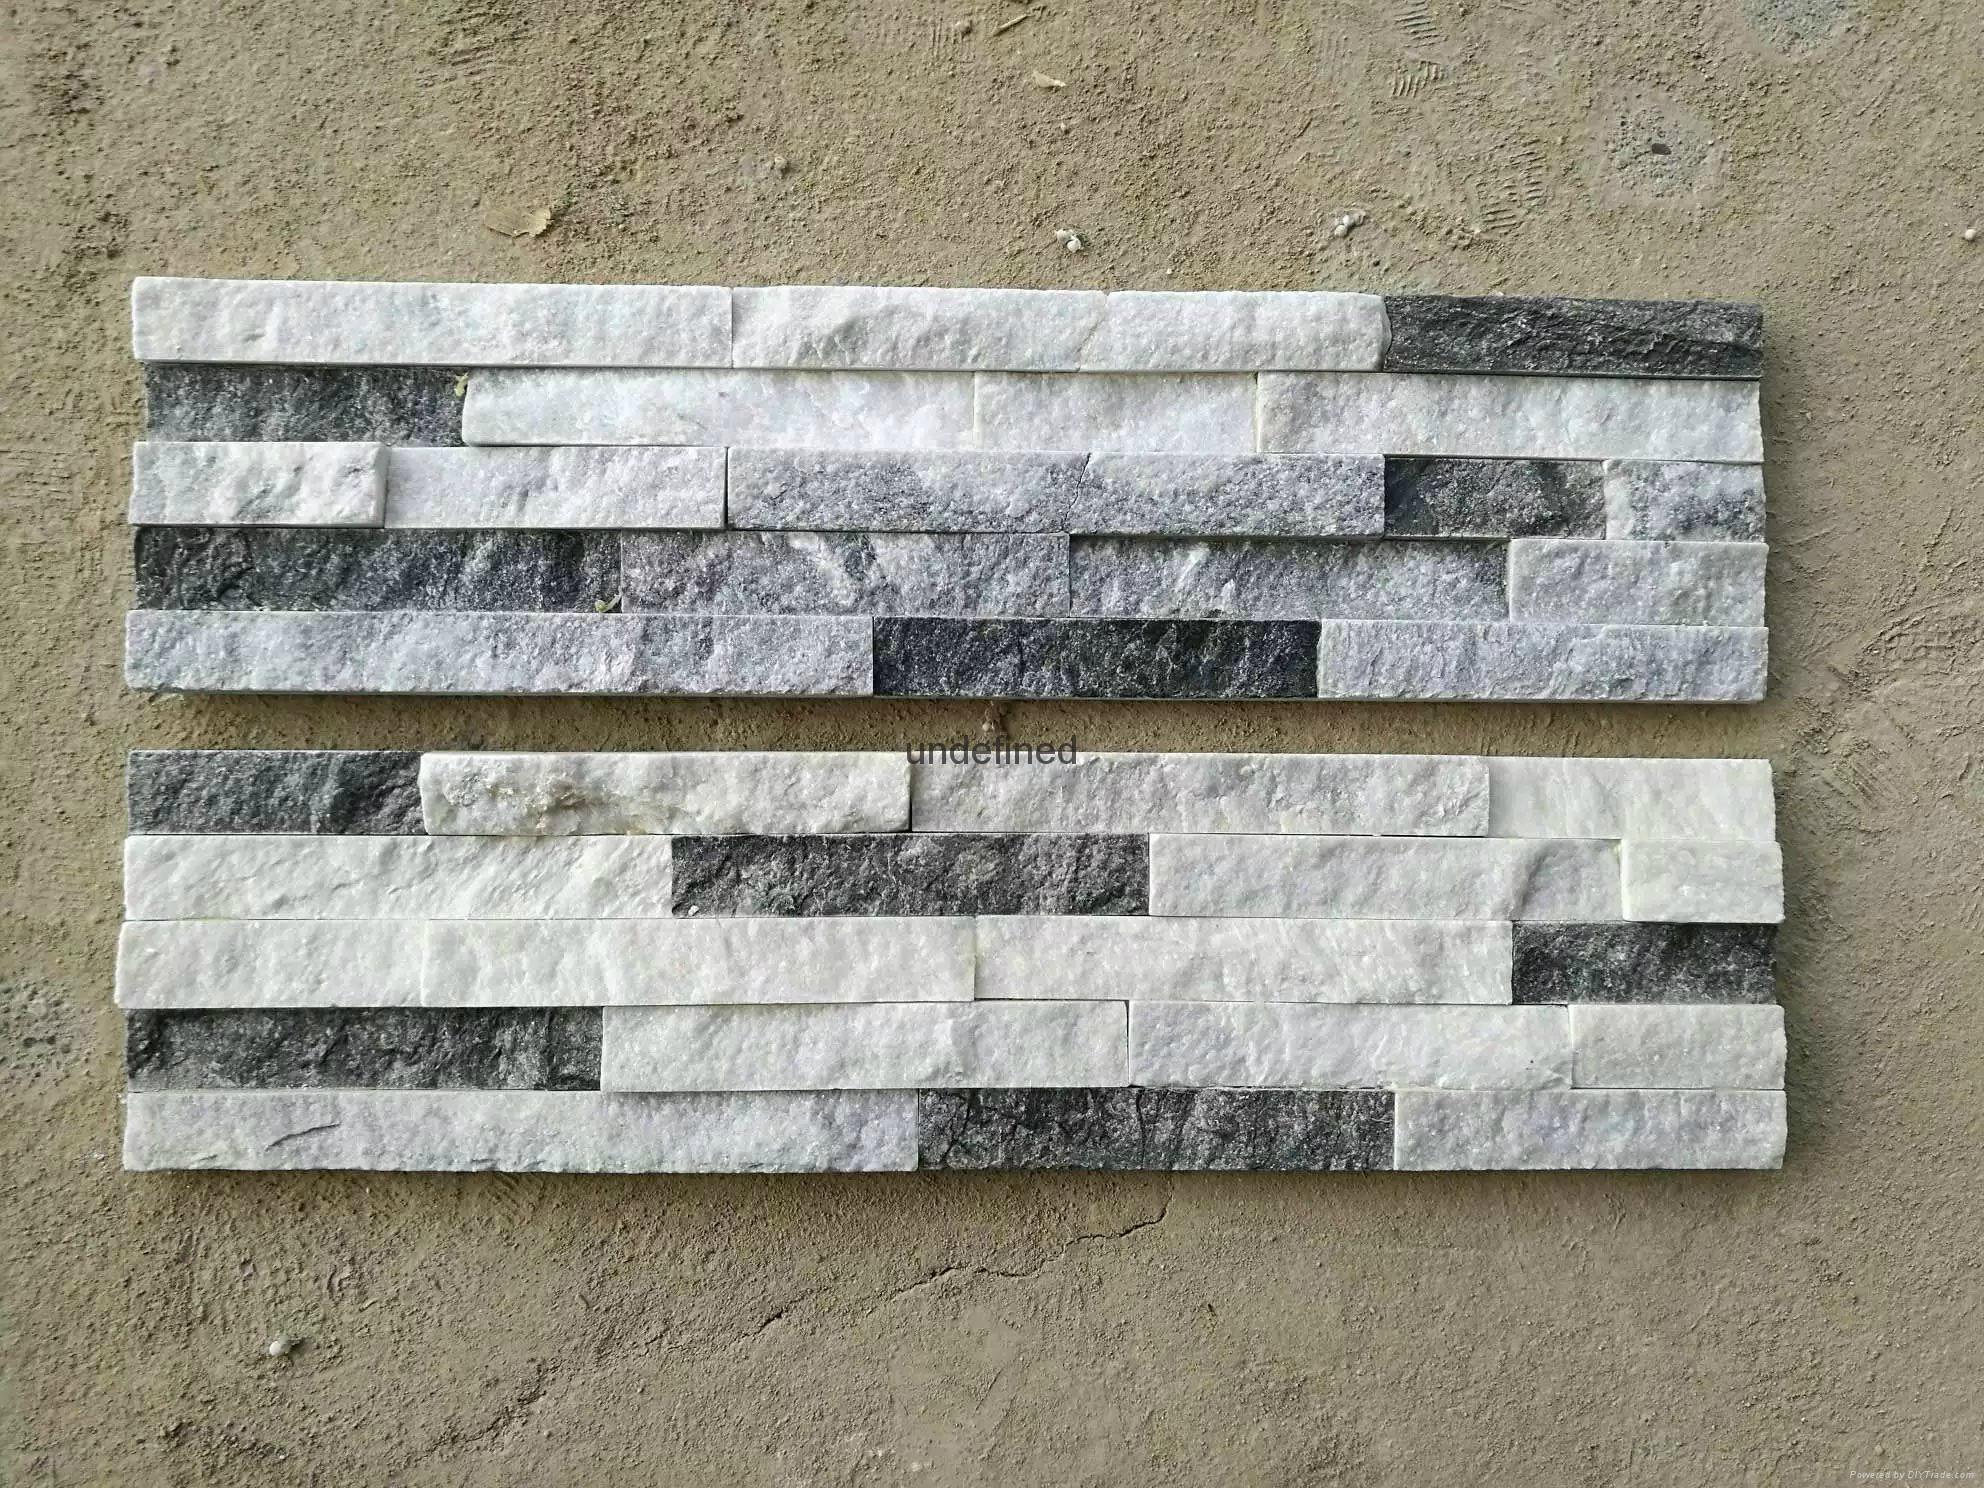 Stone marble granite exterior wall cladding view cladding wall -  Natural Pure White Quartz Stone Wall Cladding 5